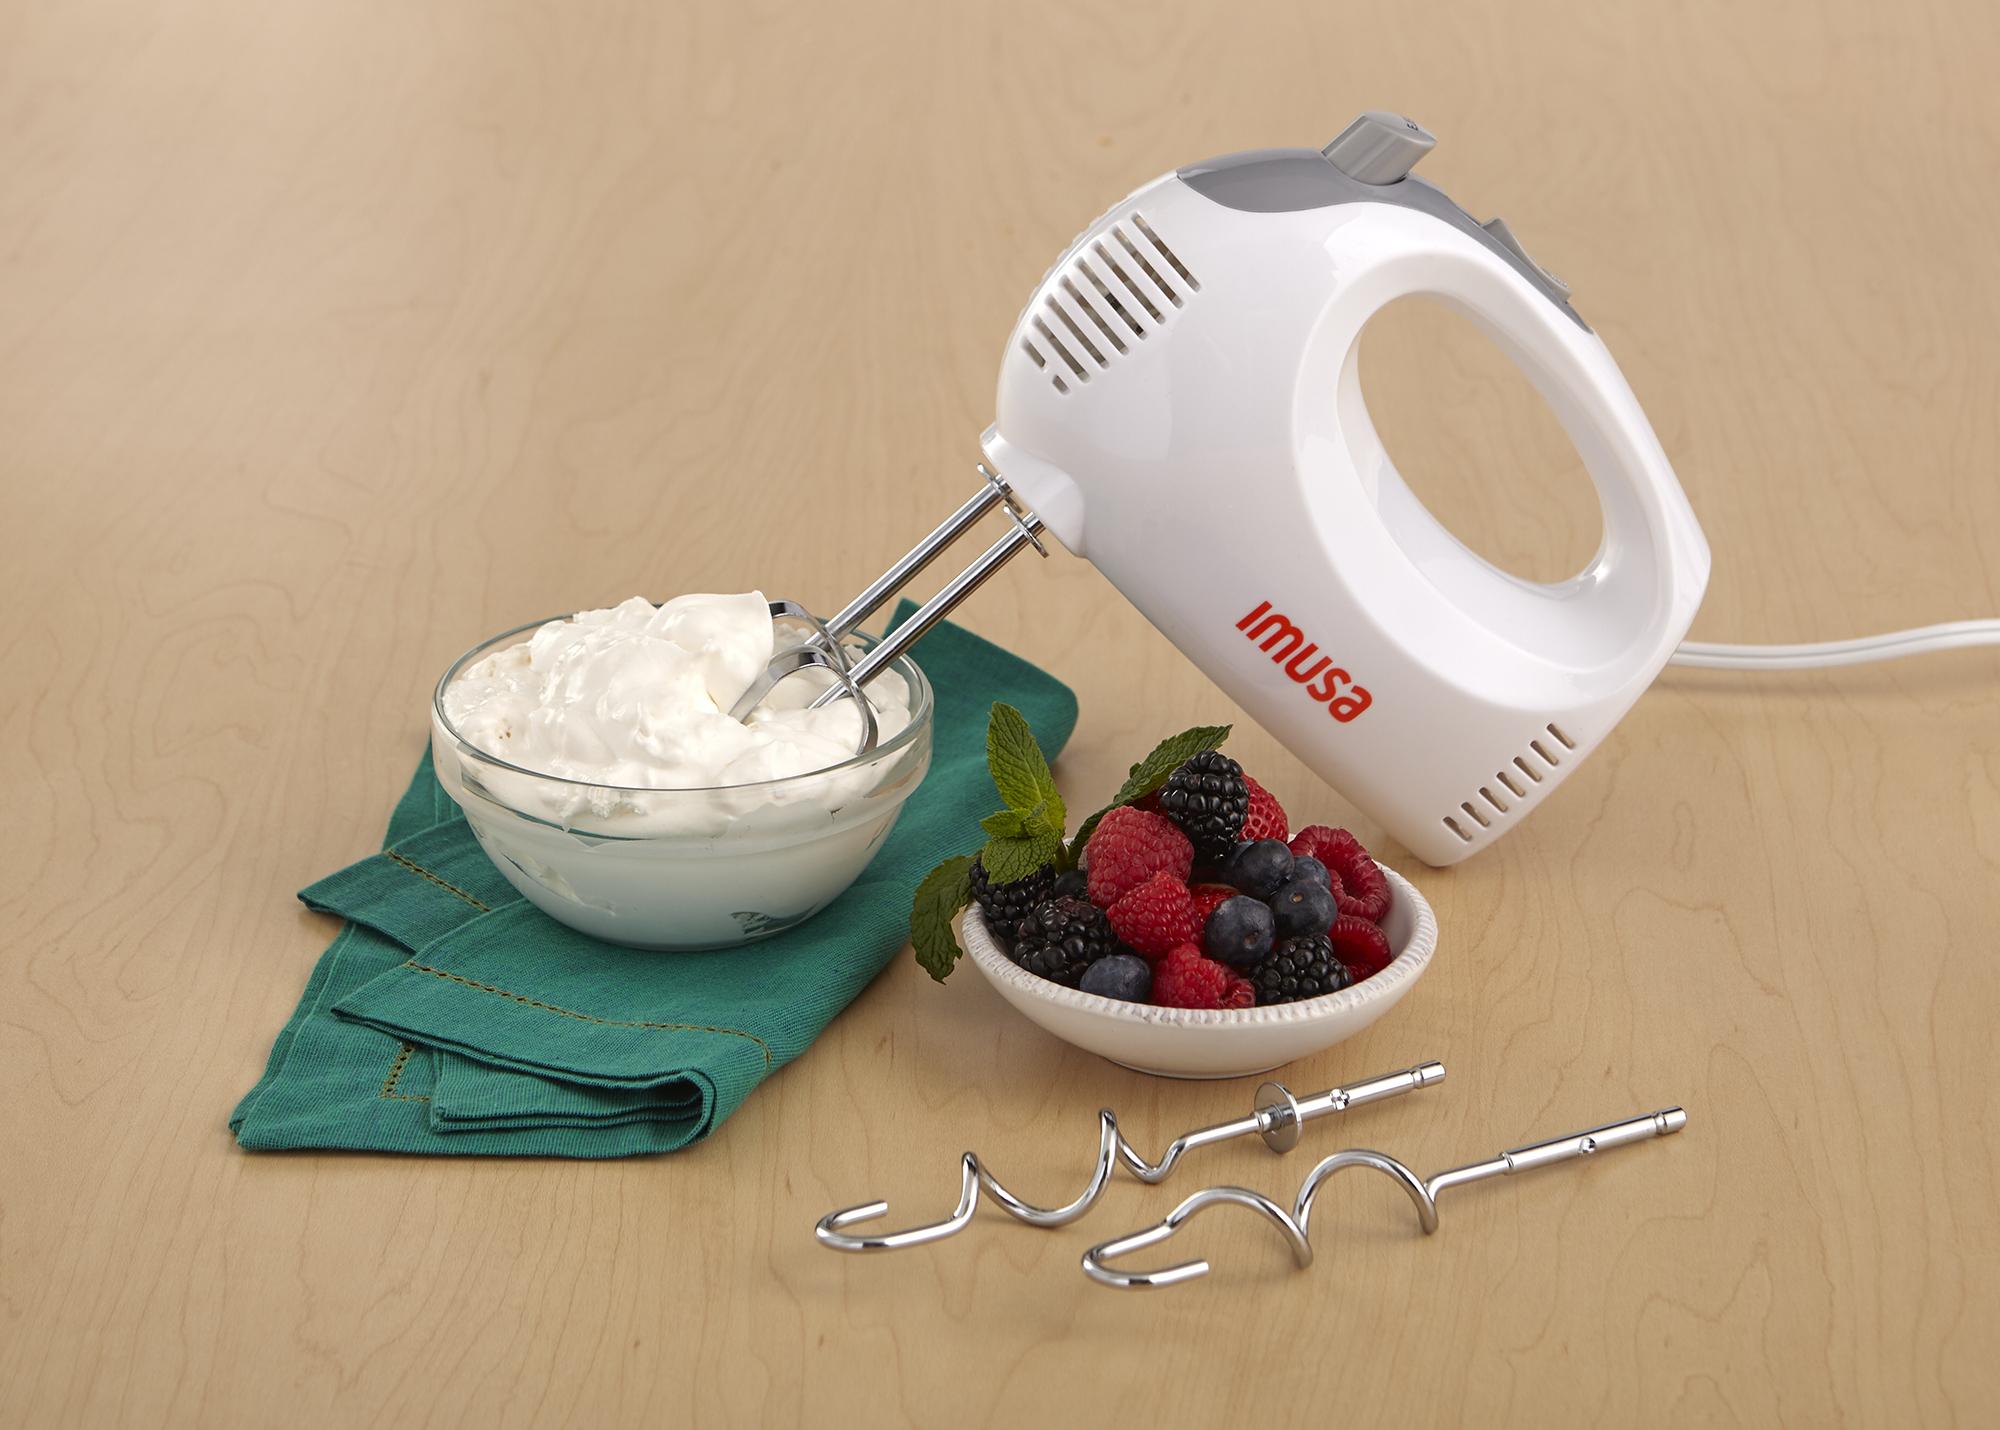 IMUSA Electric Hand Mixer 5 Speed 150 Watts, White